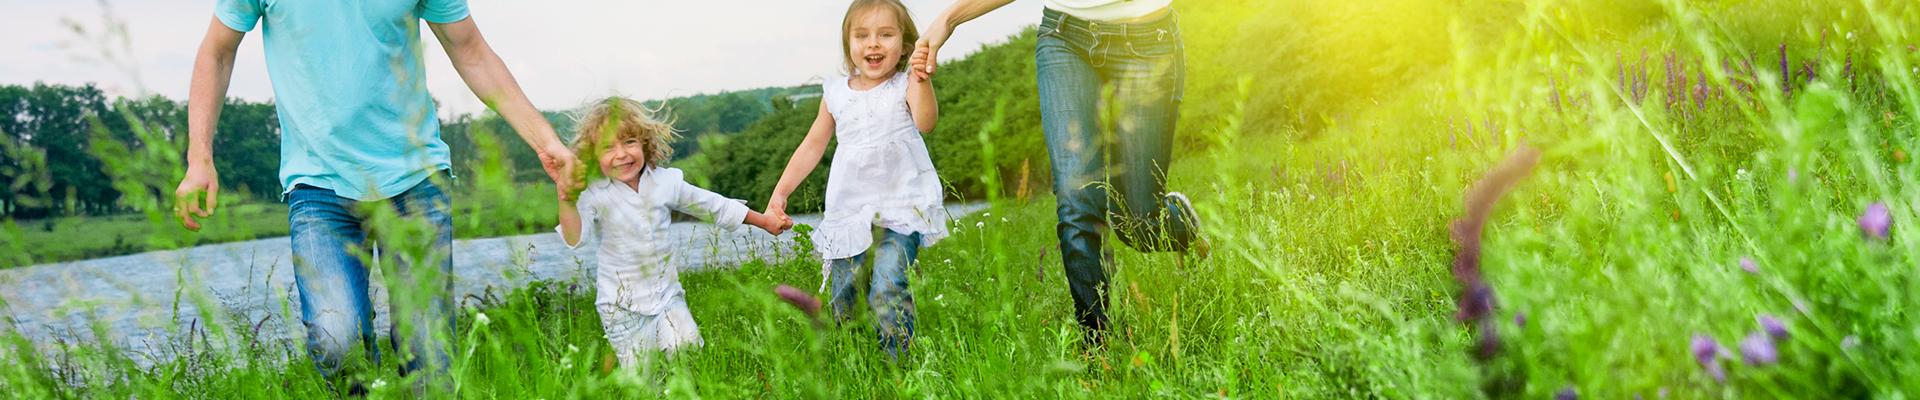 Parenting advice 2